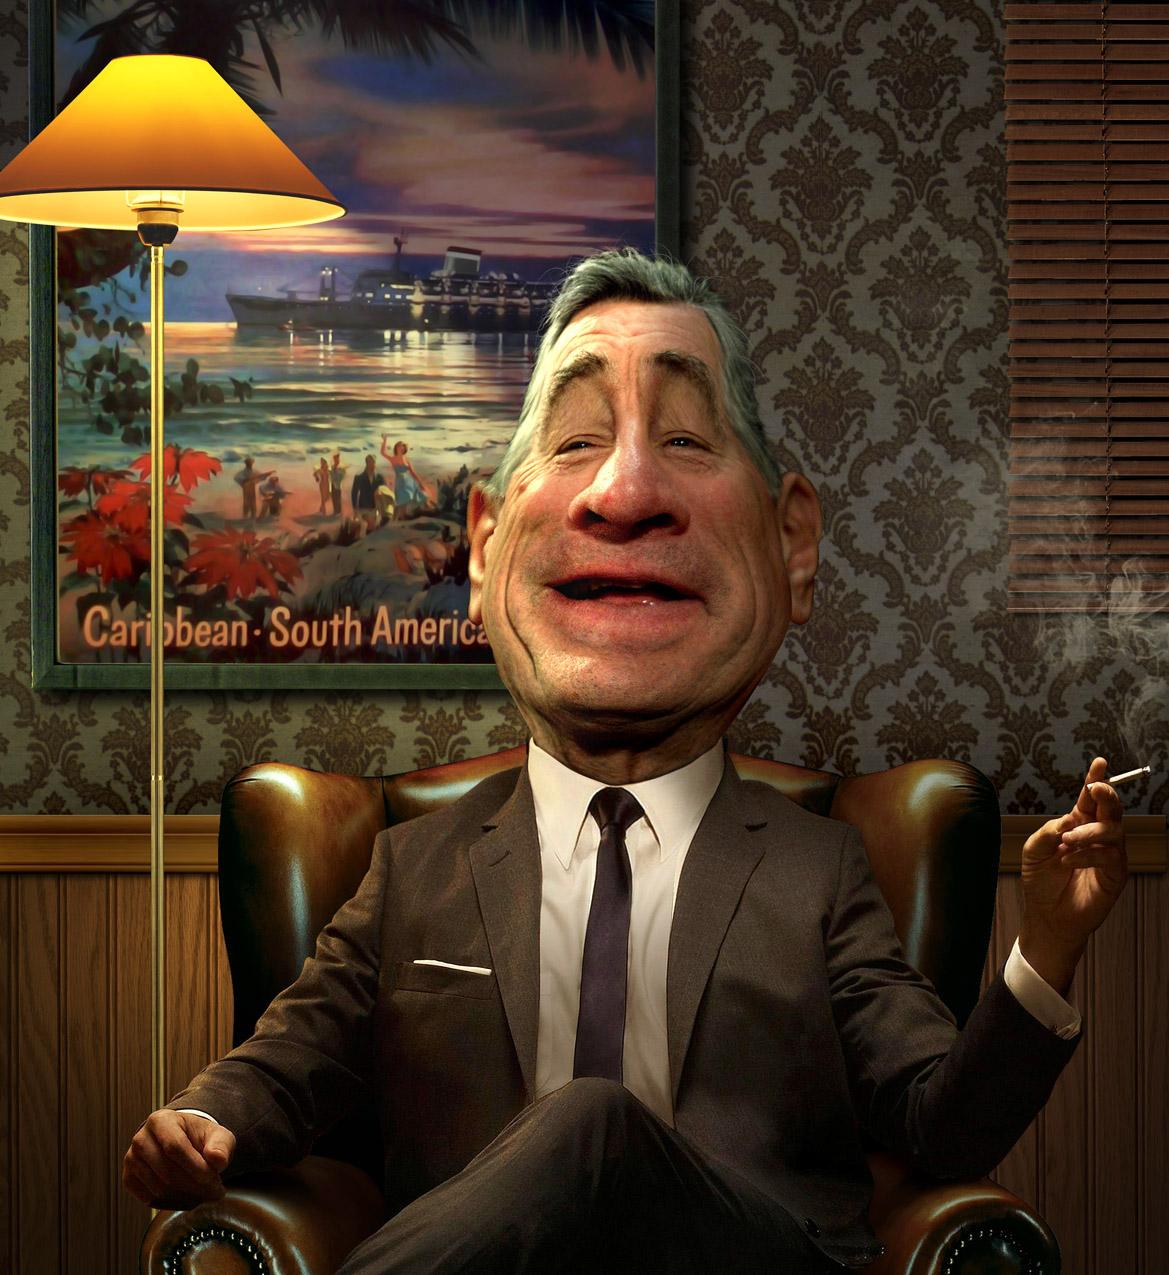 Robert De Niro by funkwood